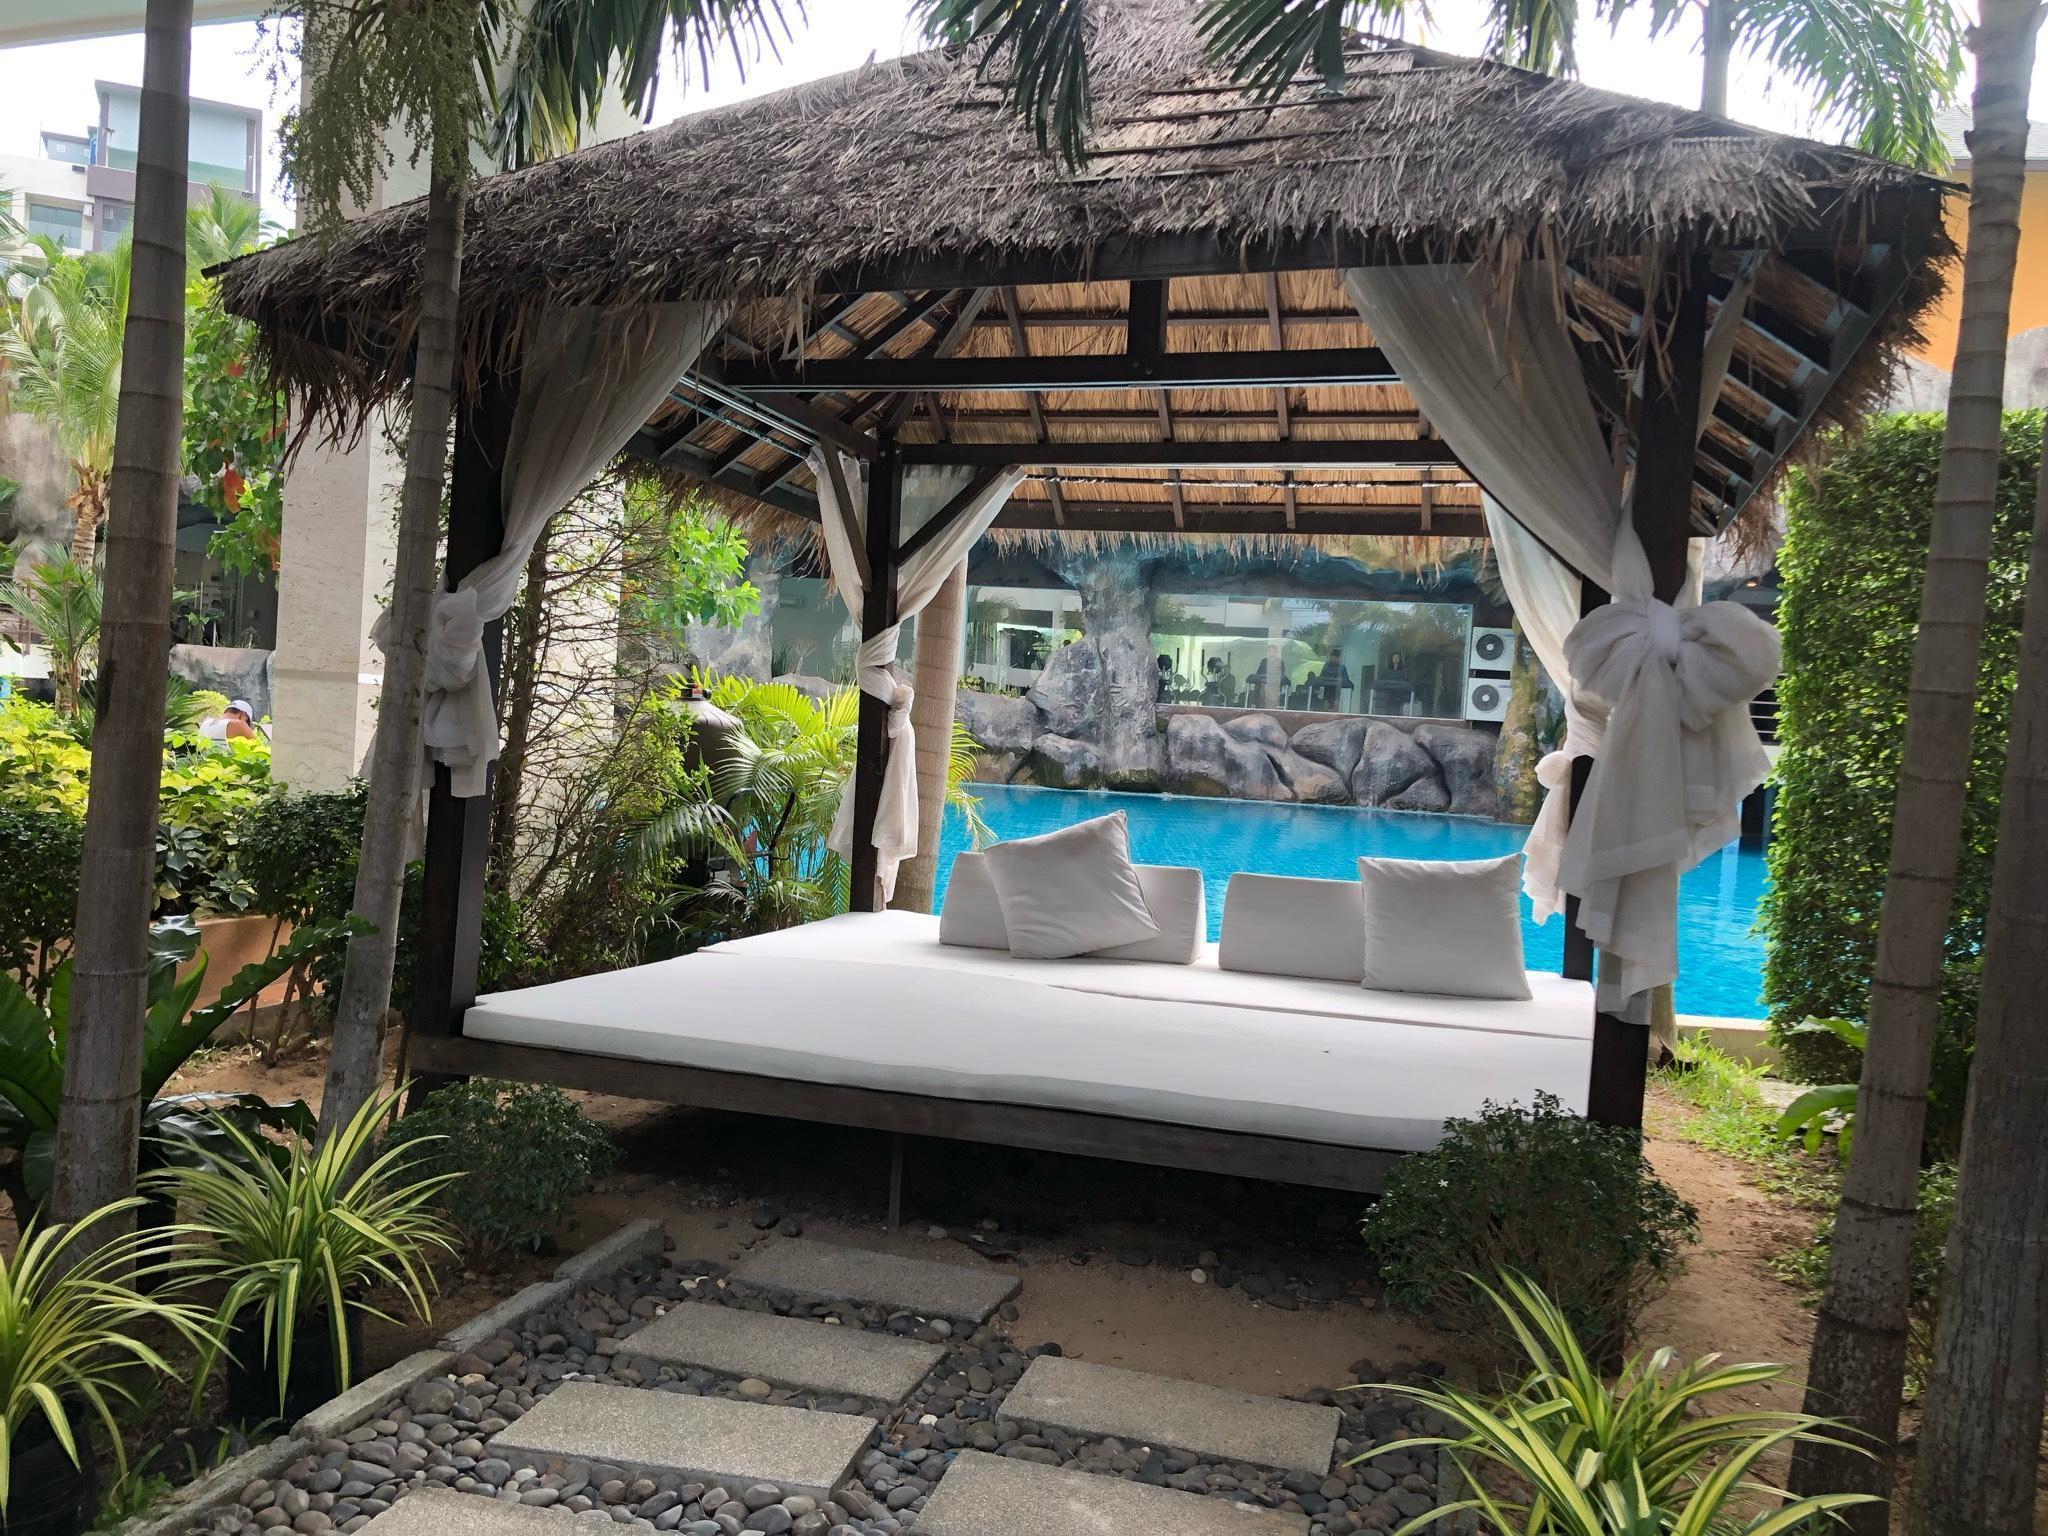 Laguna Beach Resort 3 Maldives สตูดิโอ อพาร์ตเมนต์ 1 ห้องน้ำส่วนตัว ขนาด 27 ตร.ม. – หาดจอมเทียน